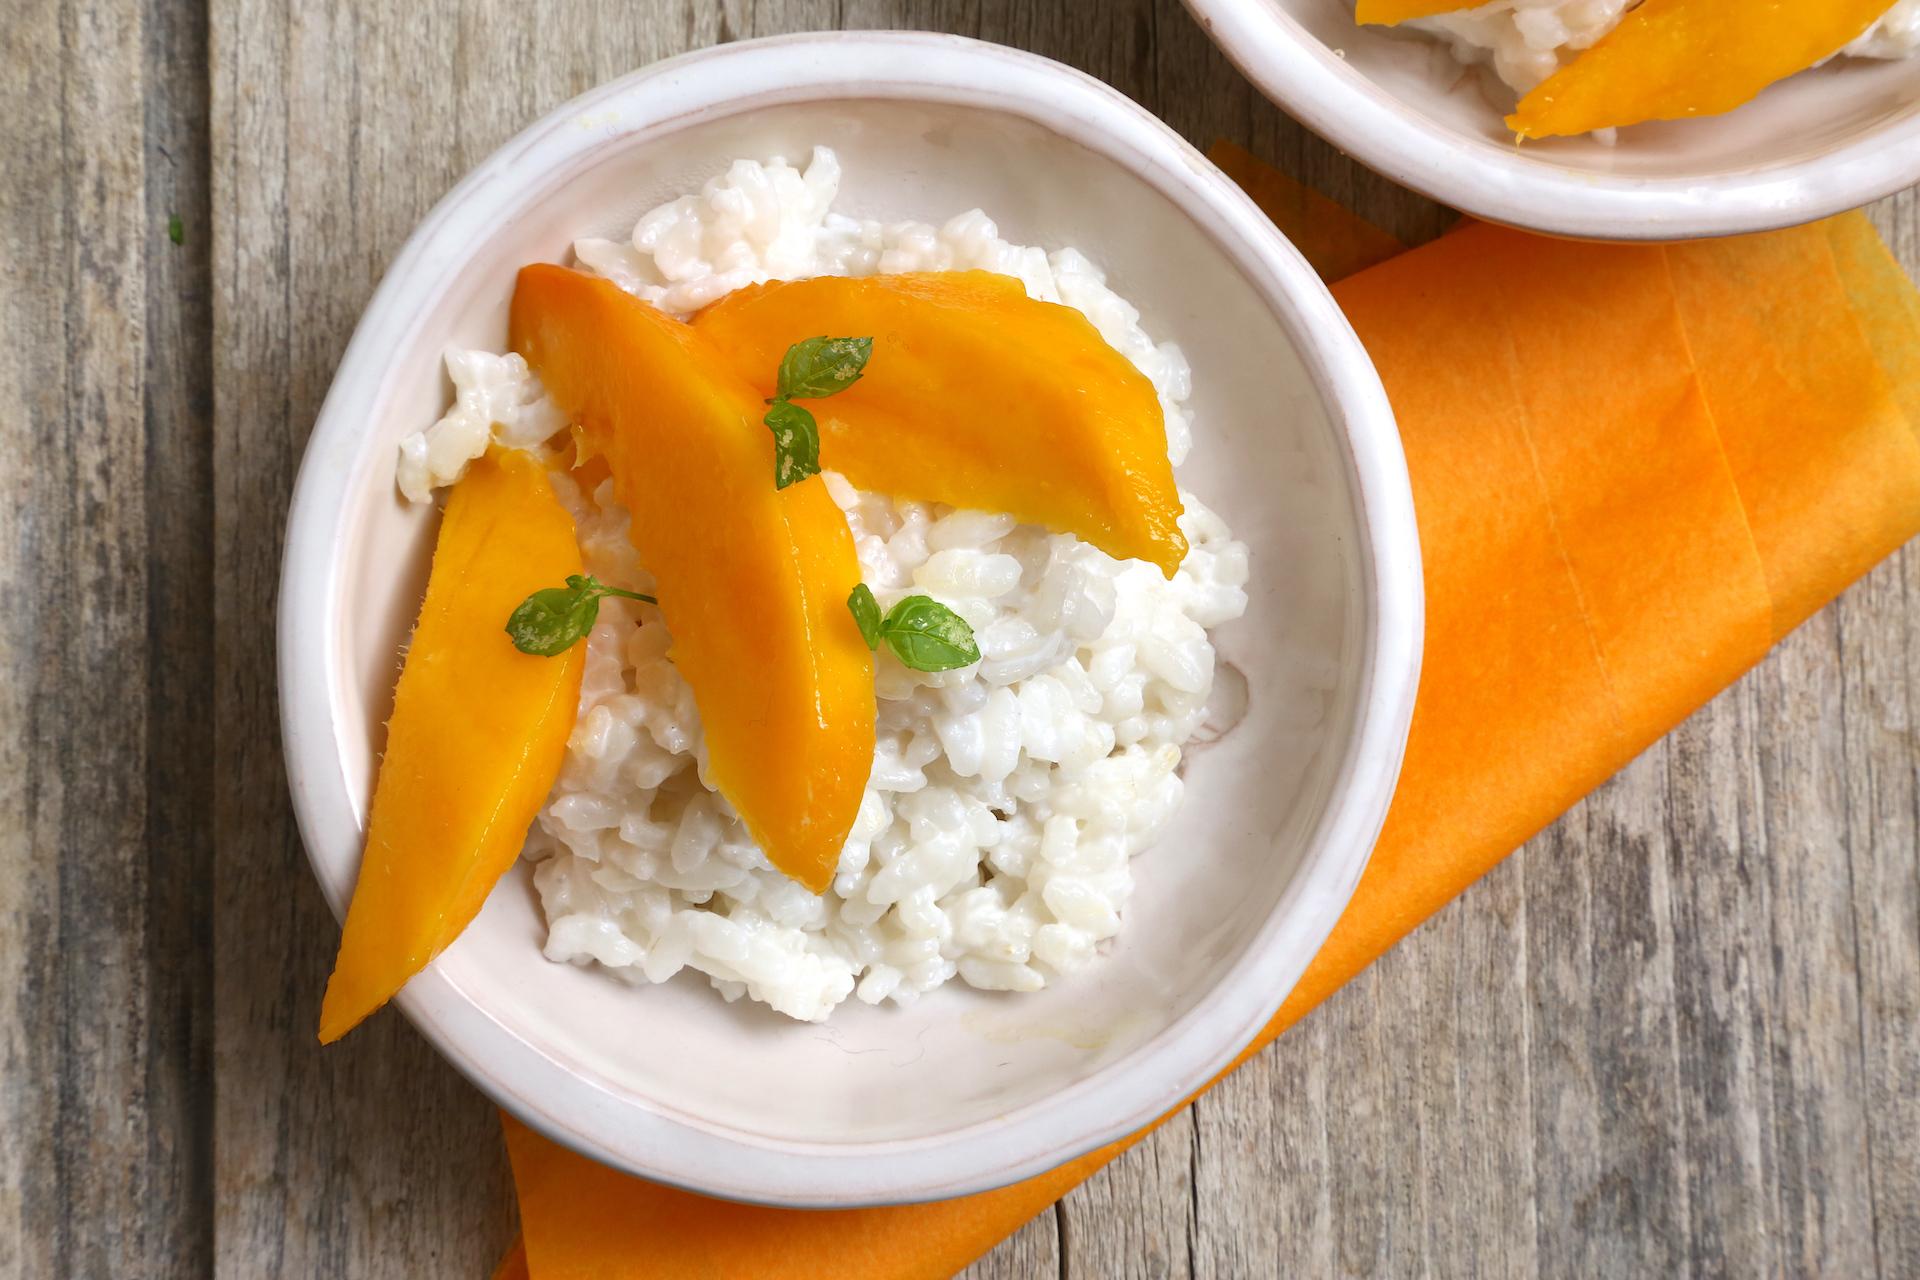 Mango sticky rice pronto © Beatrice Spagoni